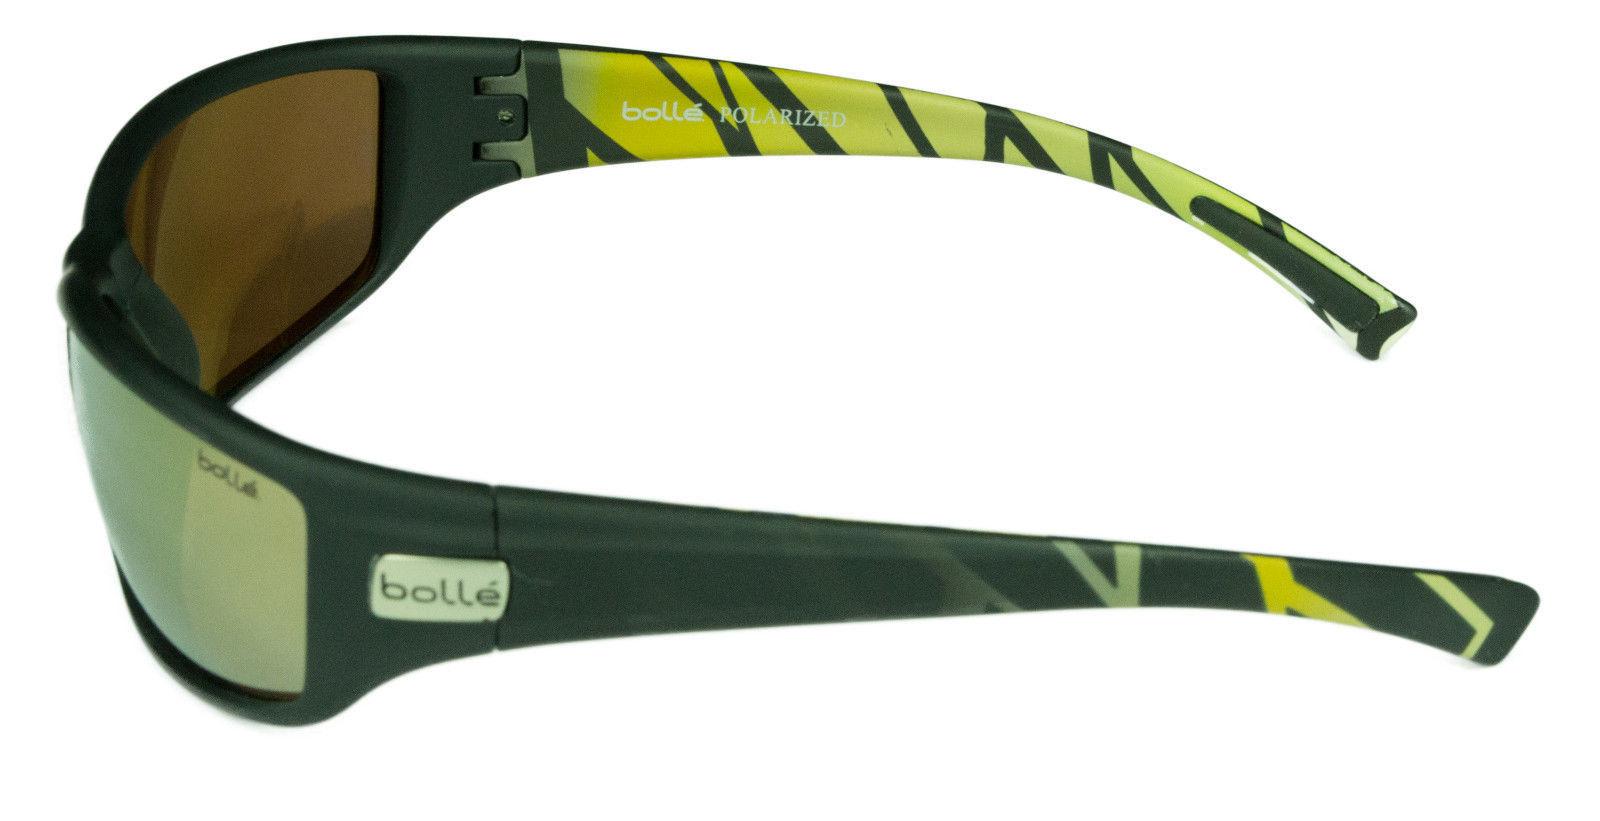 3ca2082eafa Bolle Piraja Polarized Sunglasses Matte Black Frame